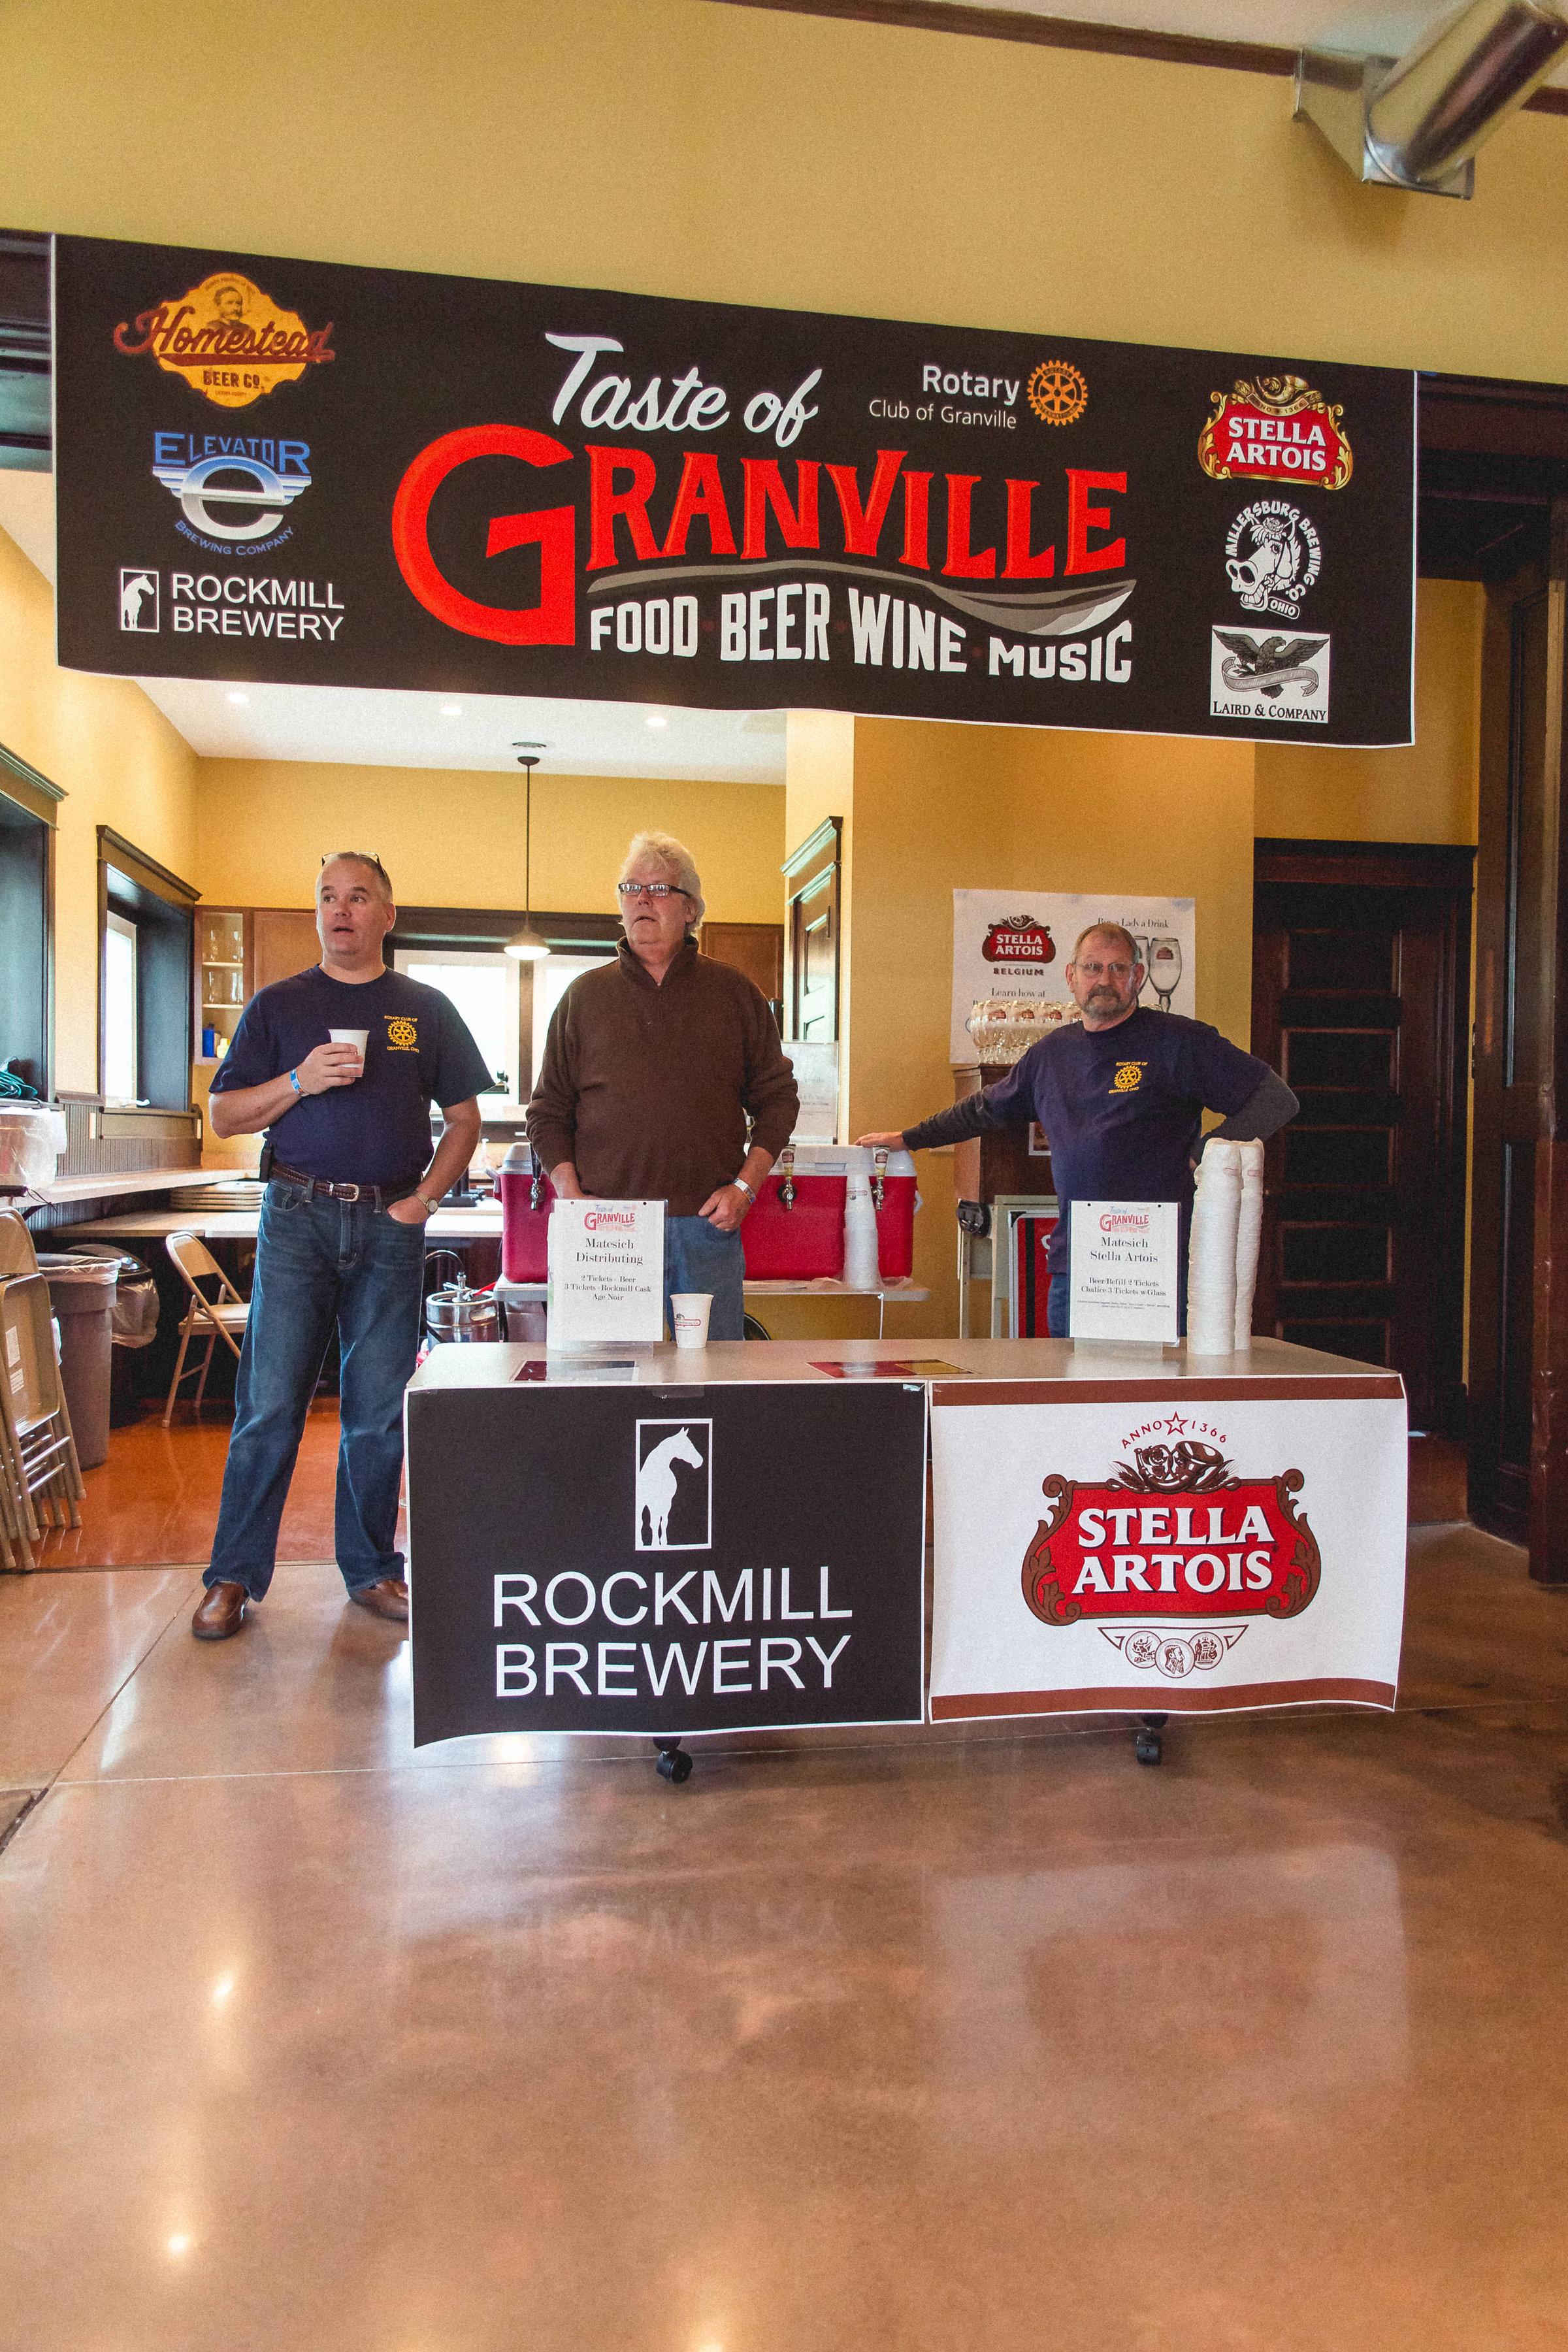 GranvilleEventPhotography-TasteofGranville2016-DiBlasioPhoto-4.jpg